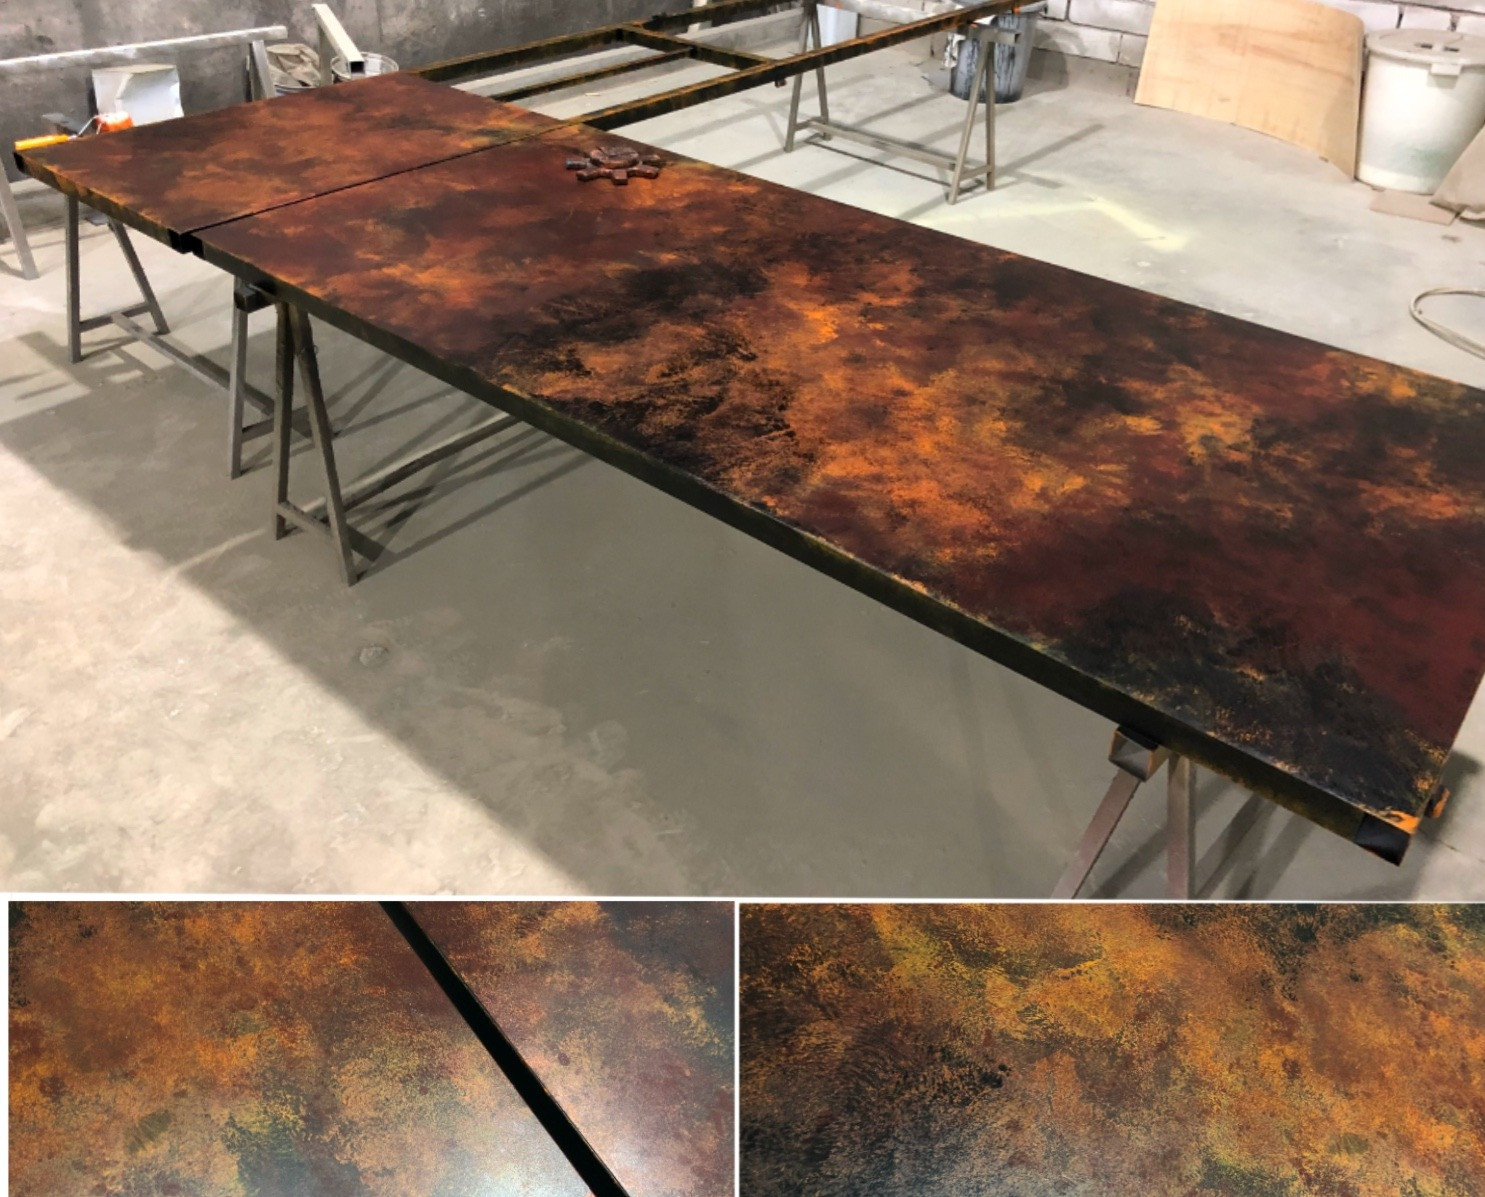 Rusty painting